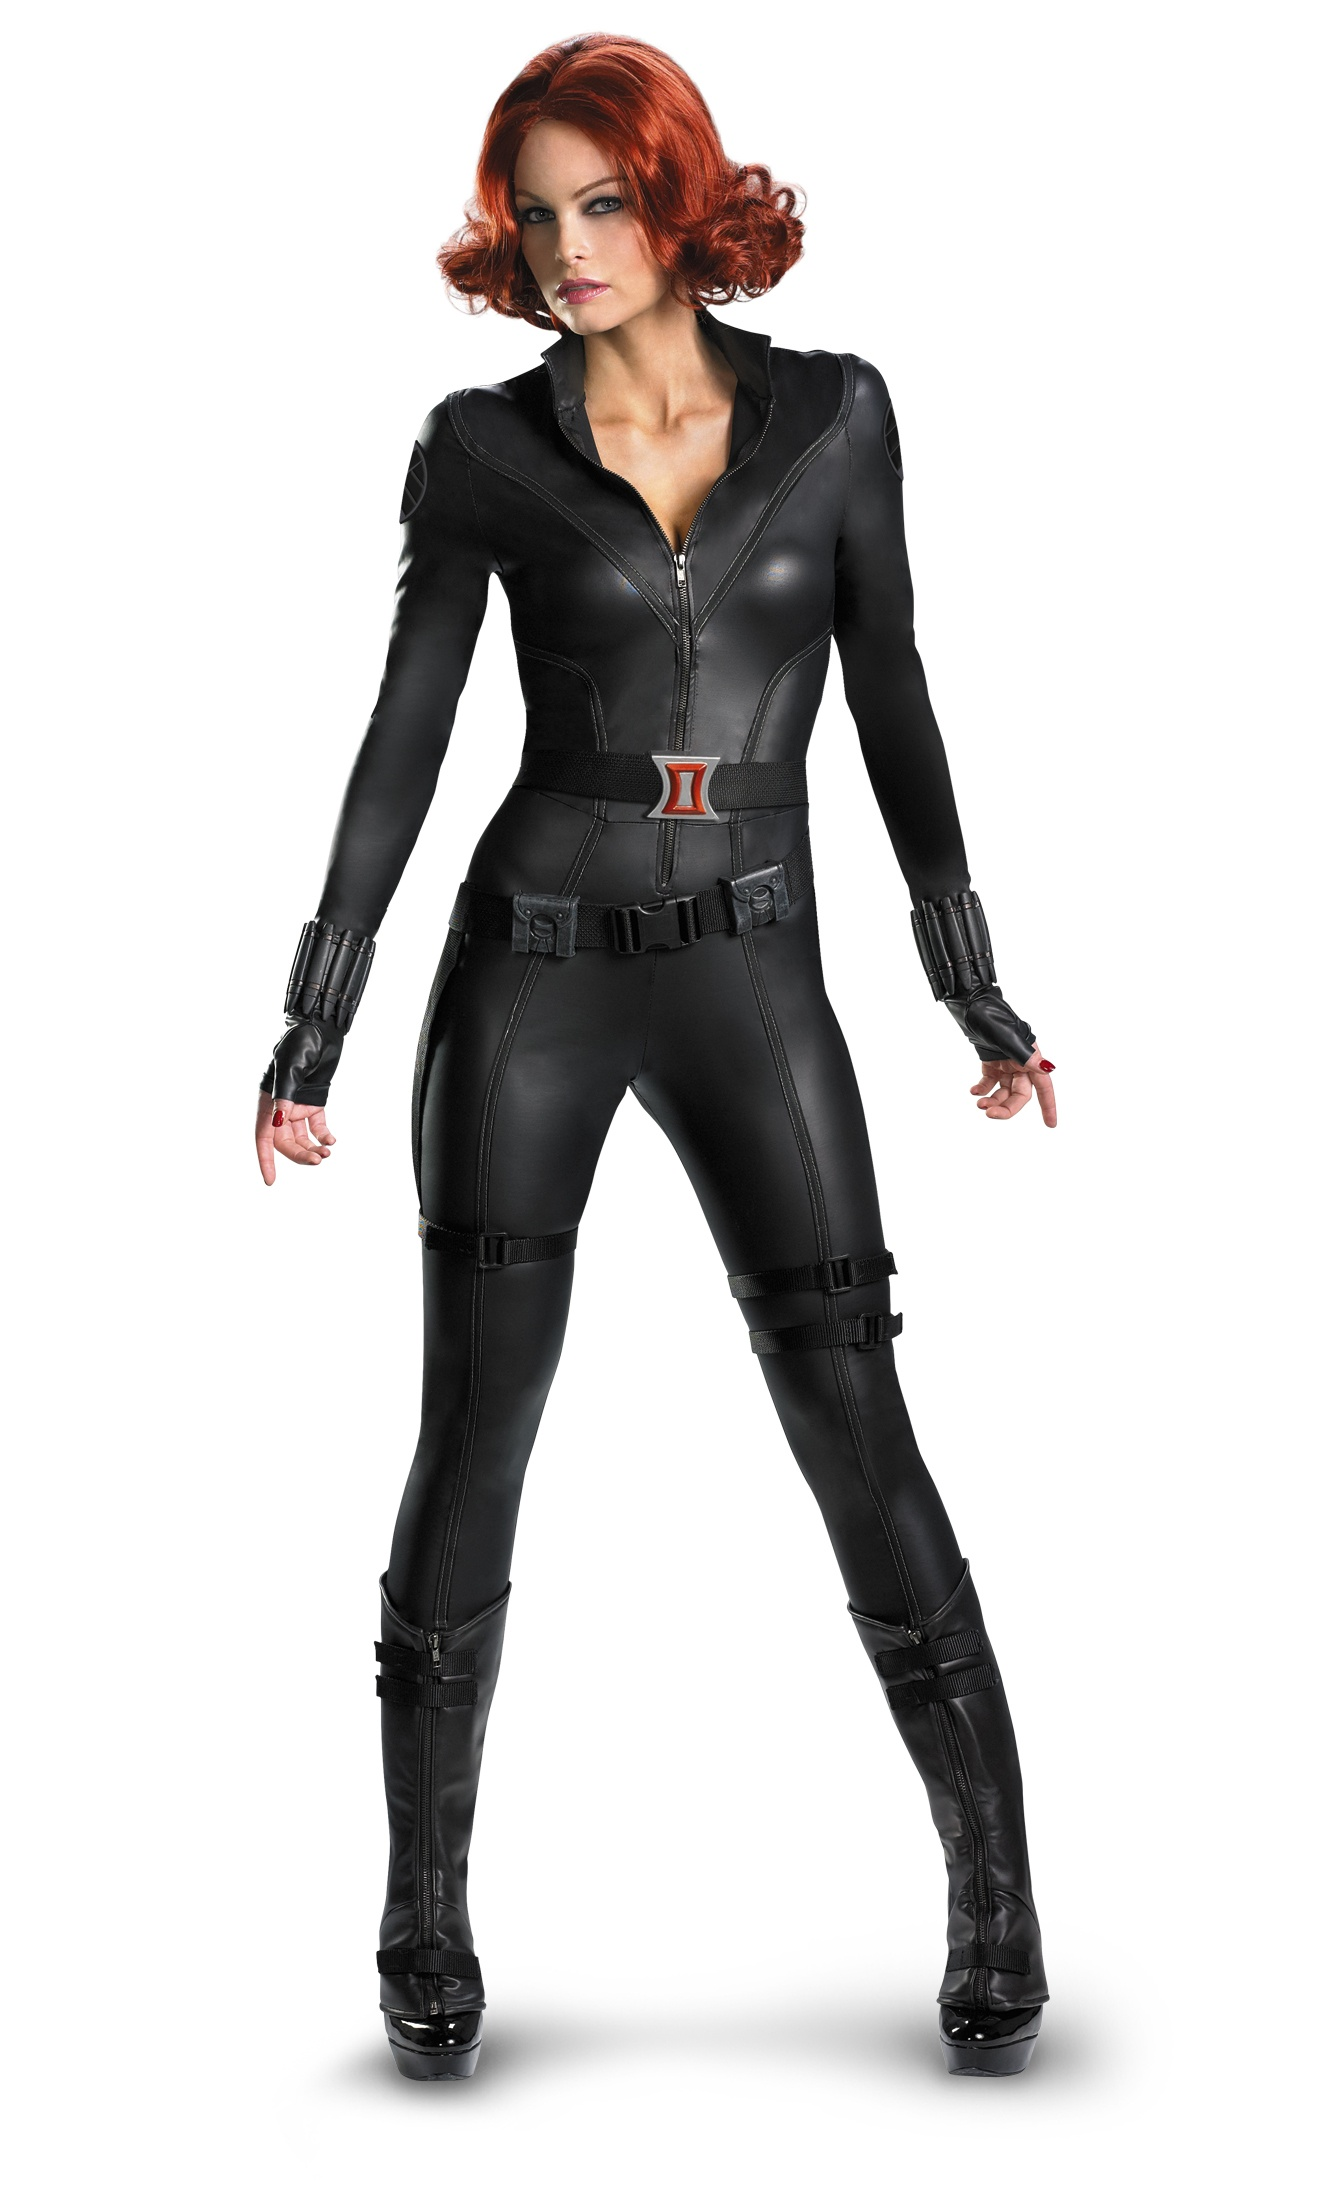 Avengers Black Widow Elite Adult Costume $132.90 - Women Costumes